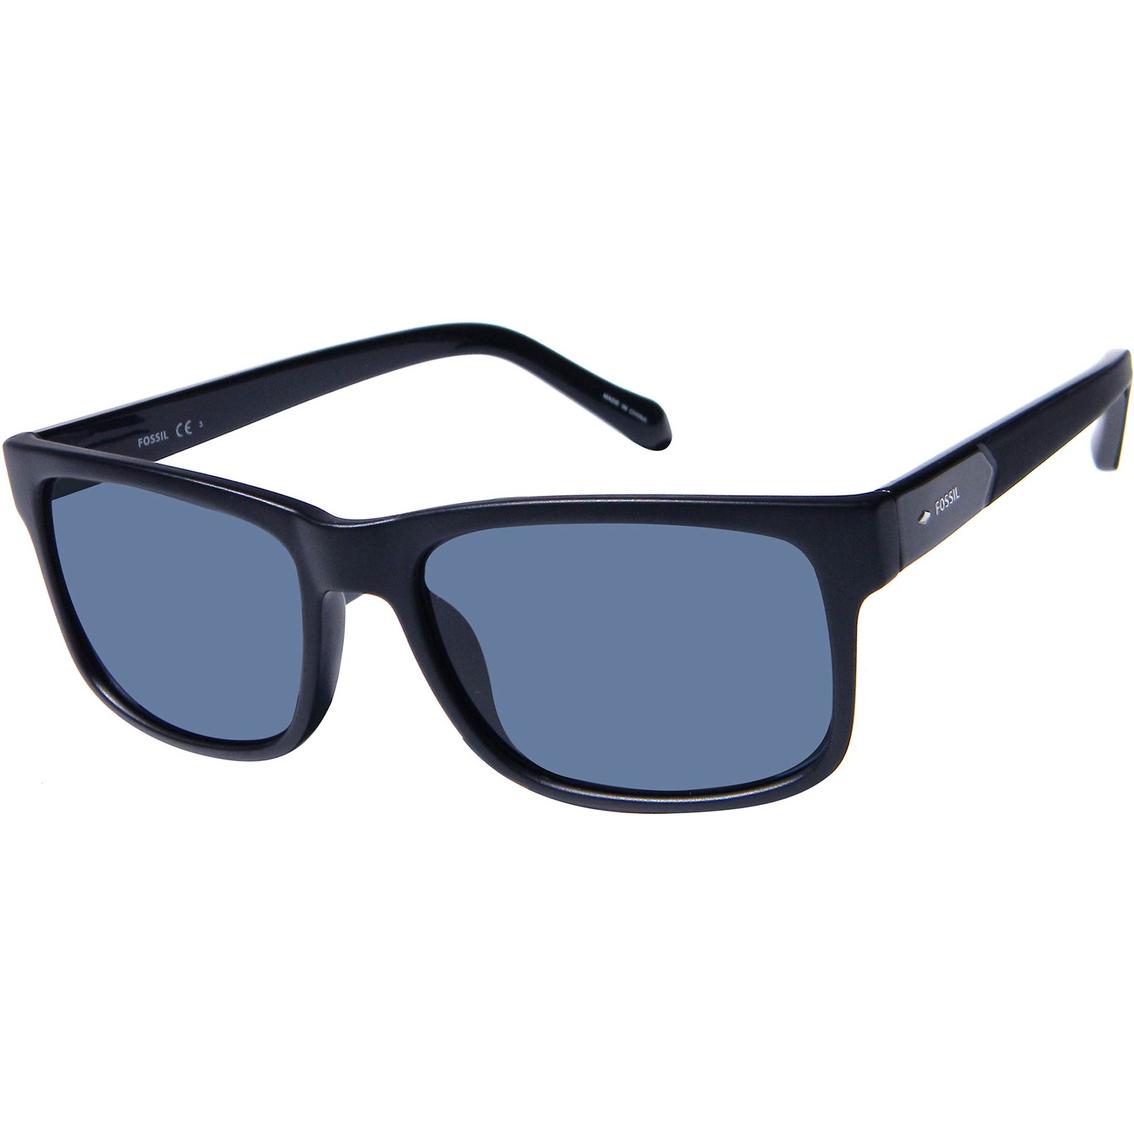 fbeed89153 Fossil Plastic Rectangle Gradient Sunglasses 3061s